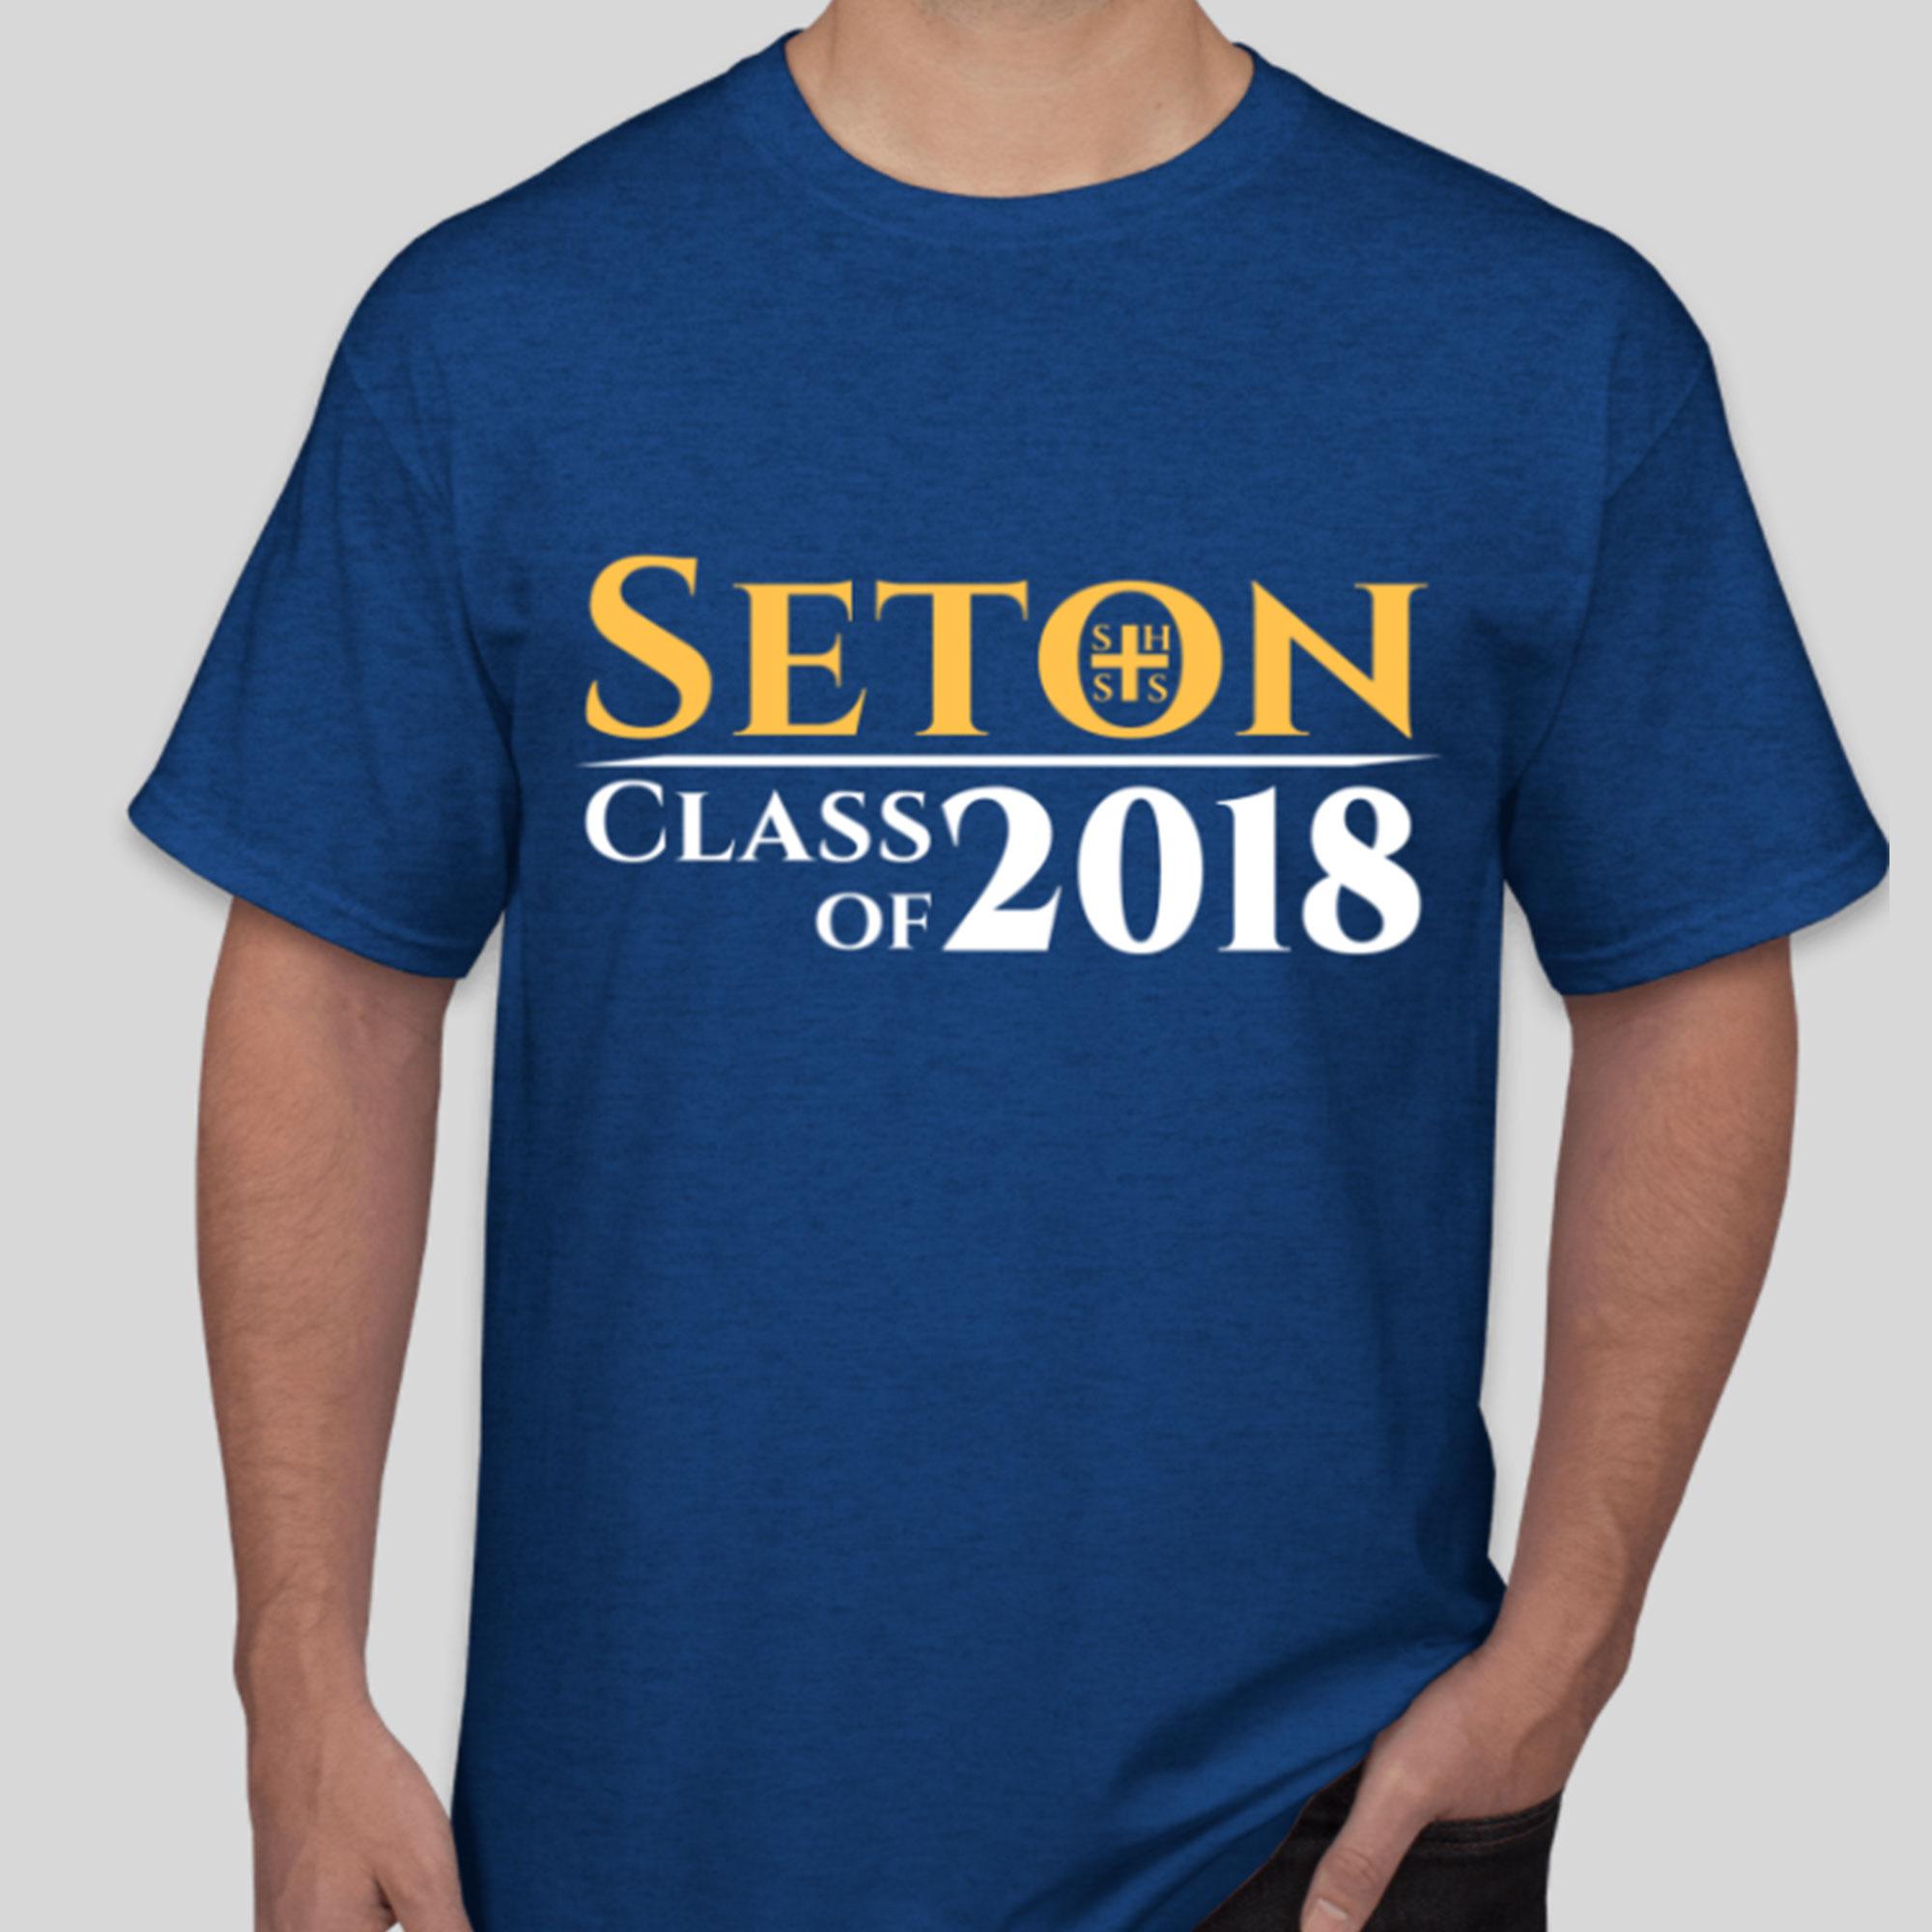 Seton Class of 2018 T-Shirt Adult Large